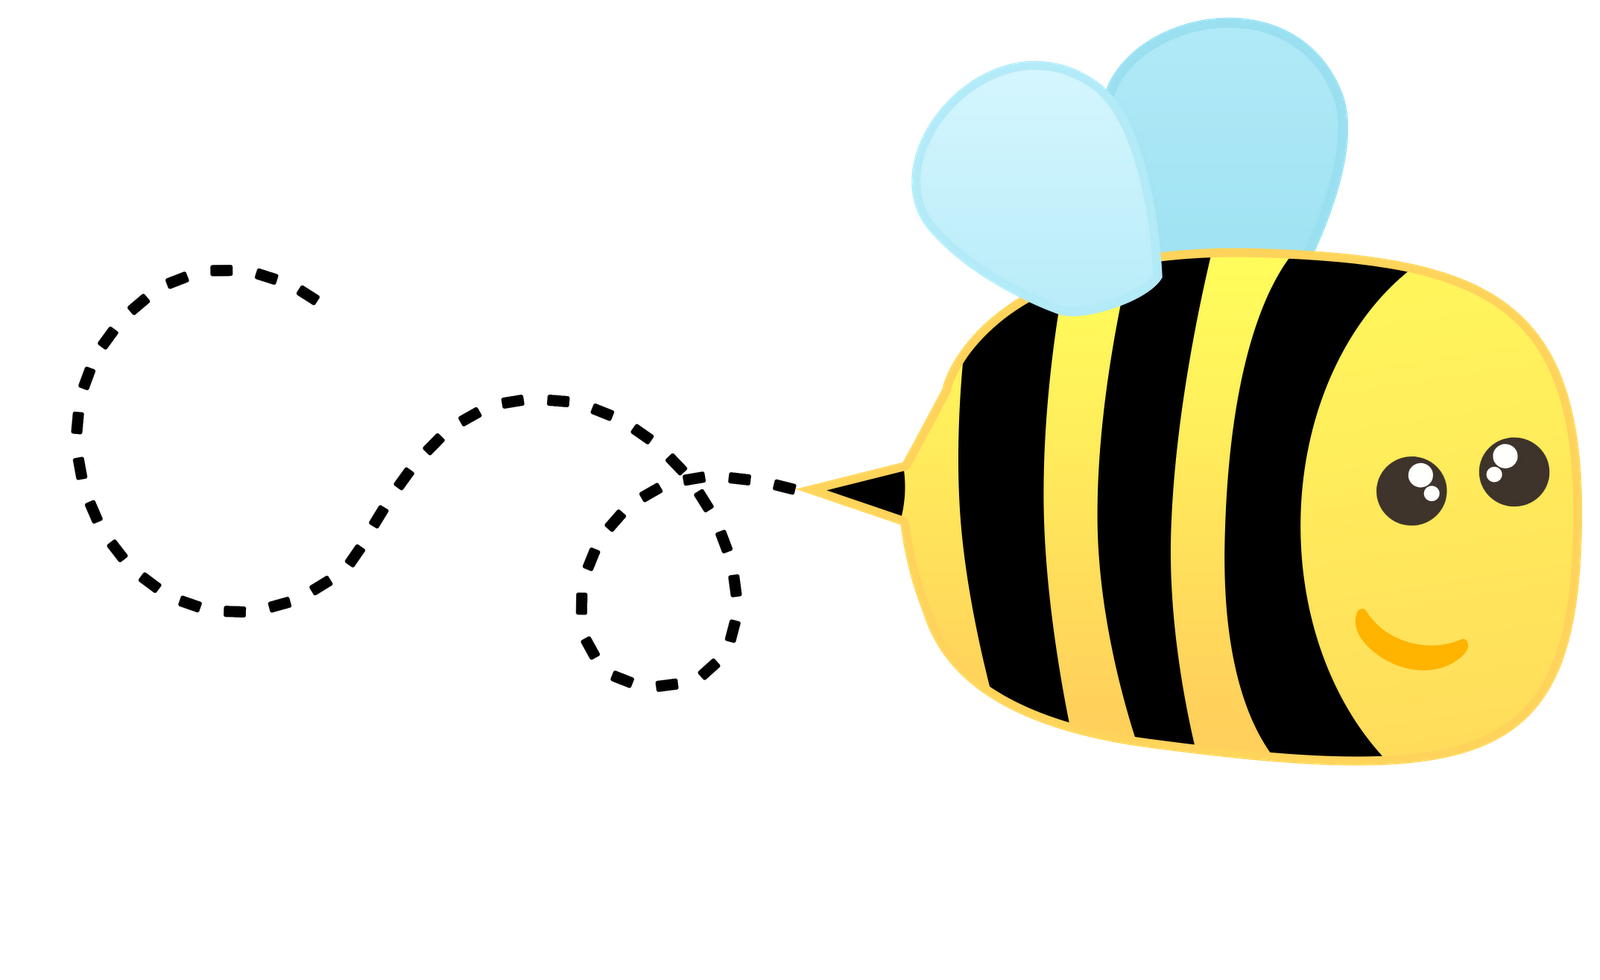 1600x980 Bee Hive Clipart Baby Bumblebee